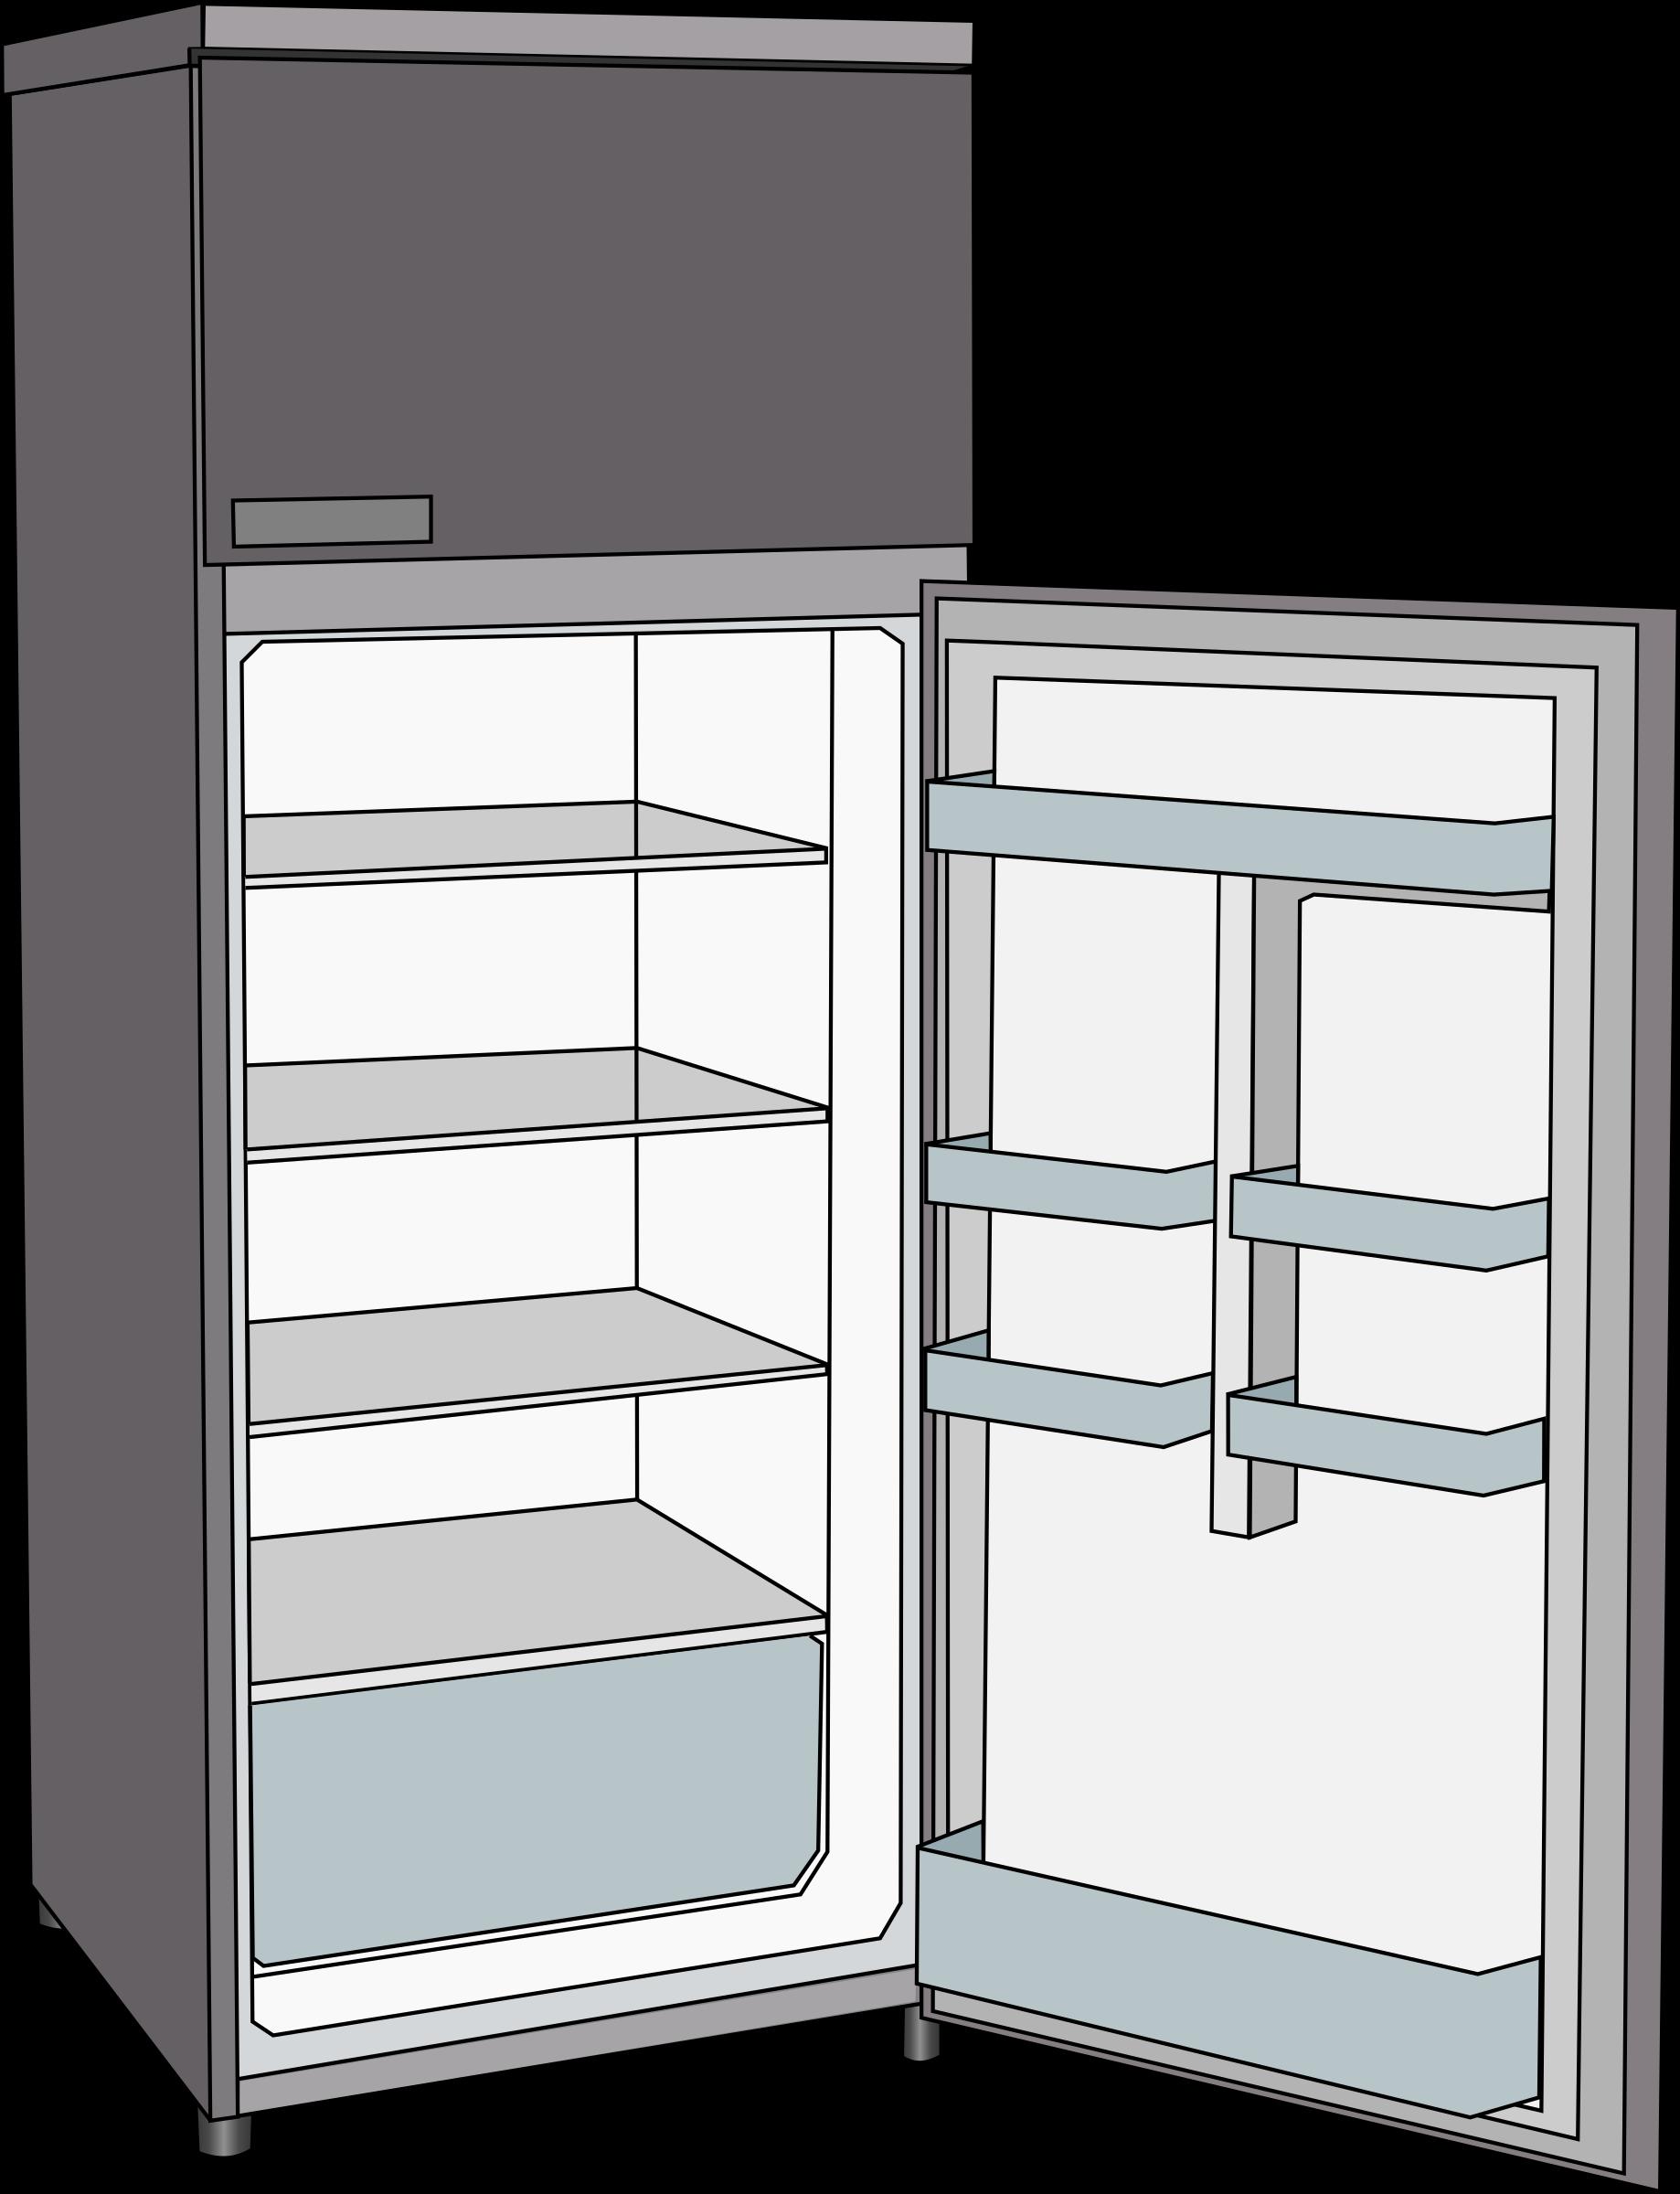 Cool clipart freezer. Frigorifero refrigerator big image